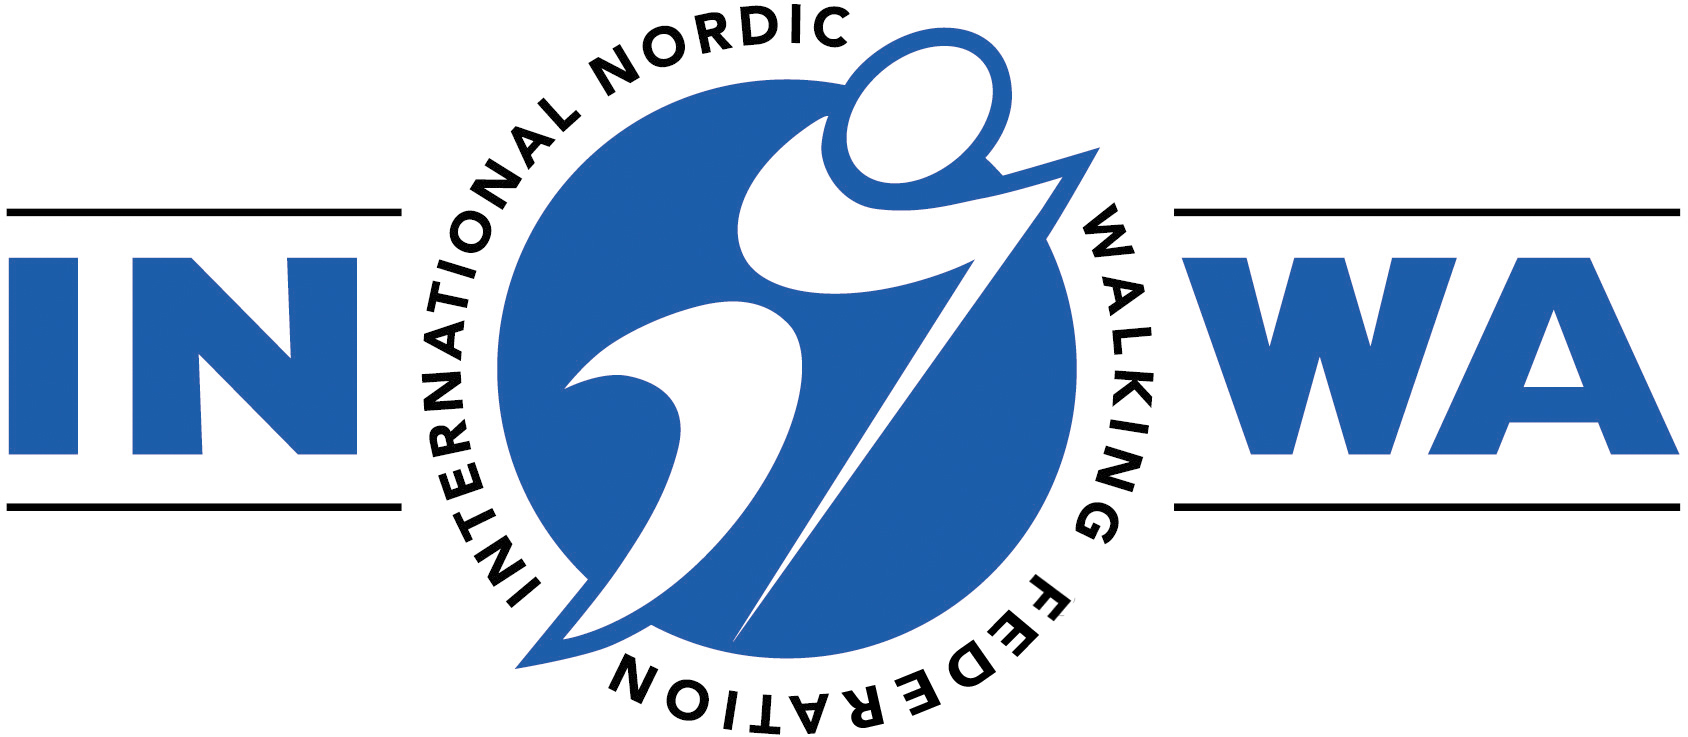 International Nordic Walking Federation